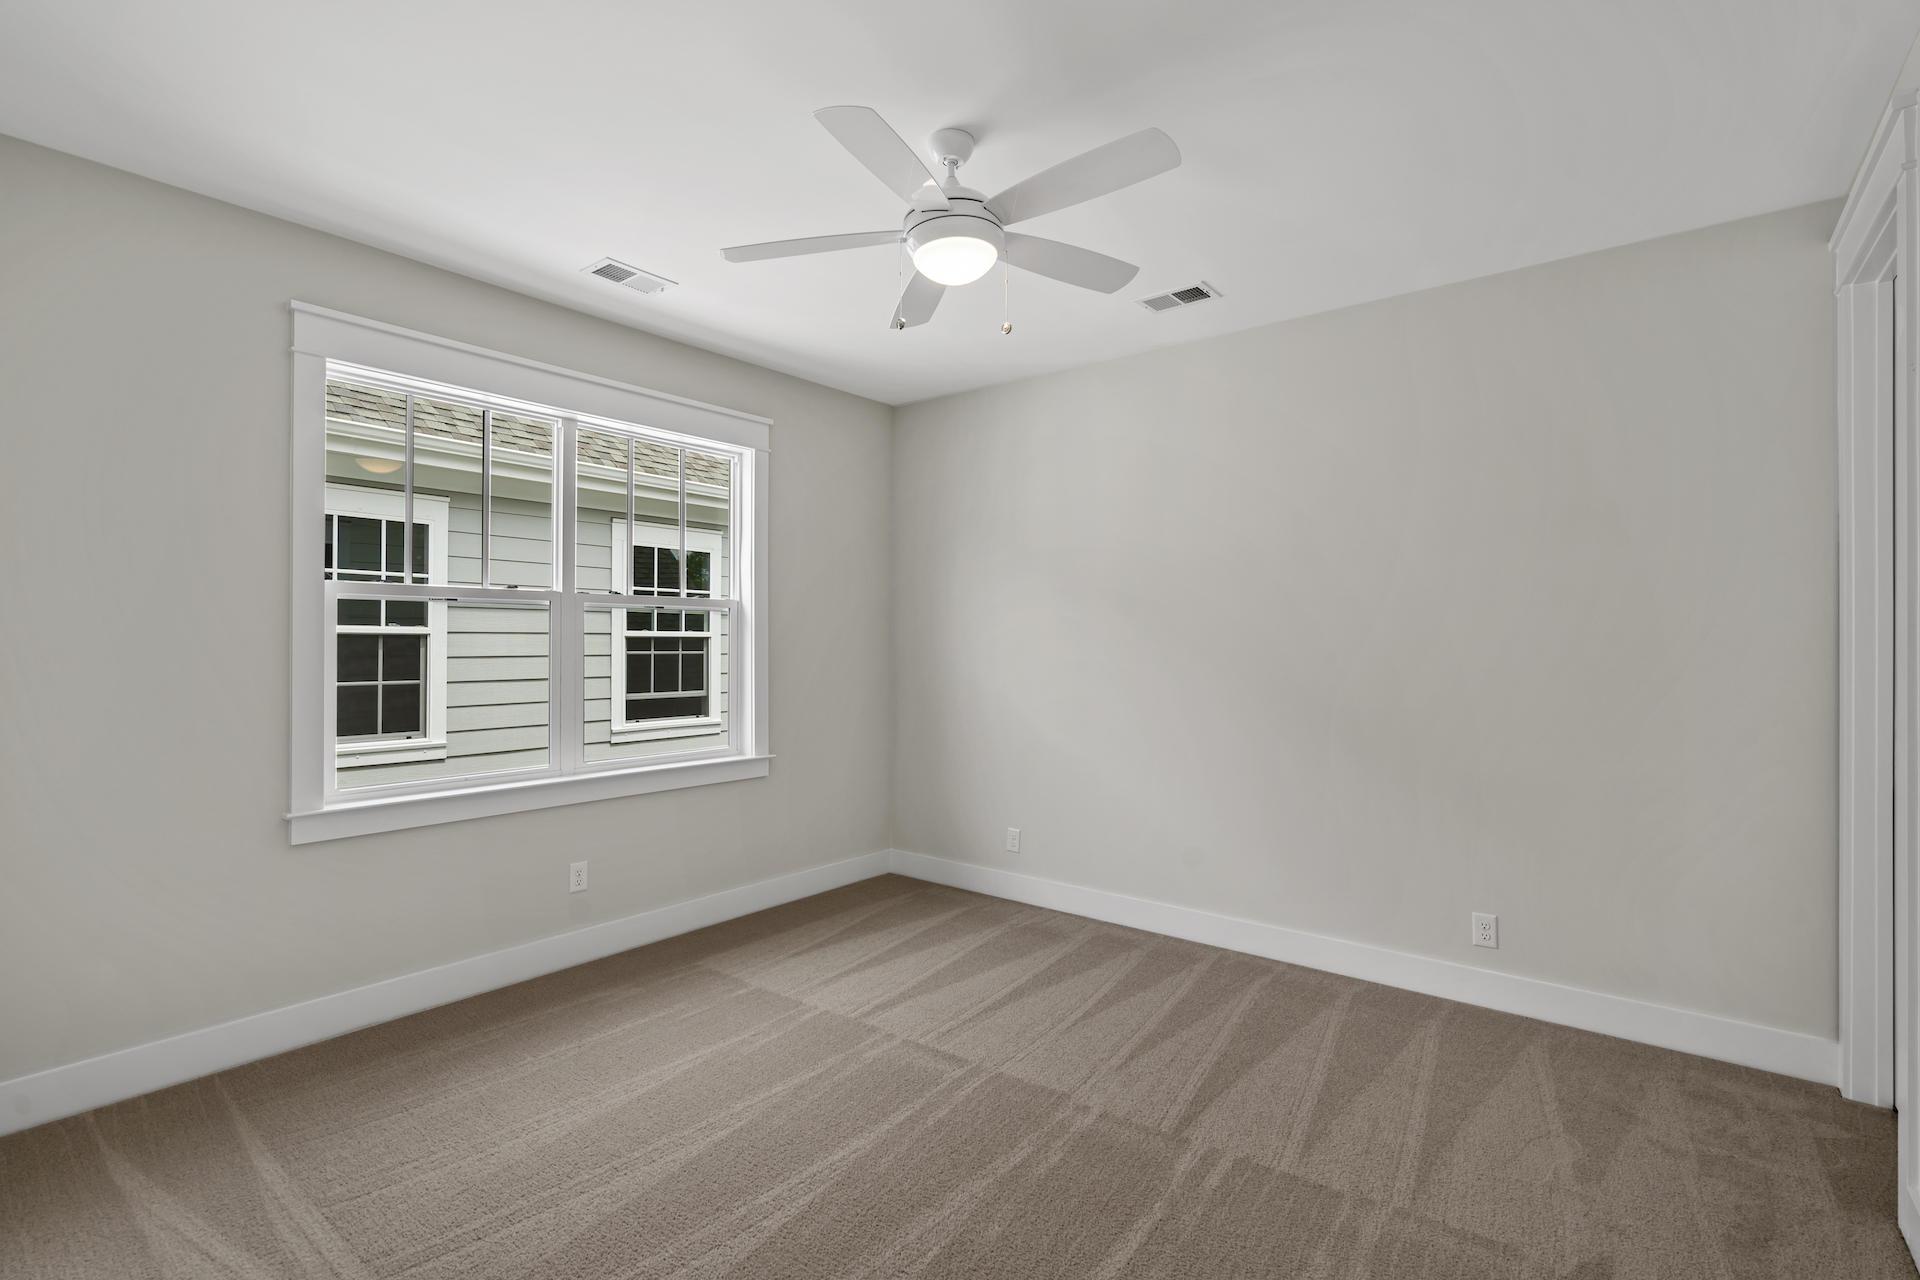 Midtown Homes For Sale - 1320 Upper Union, Mount Pleasant, SC - 7